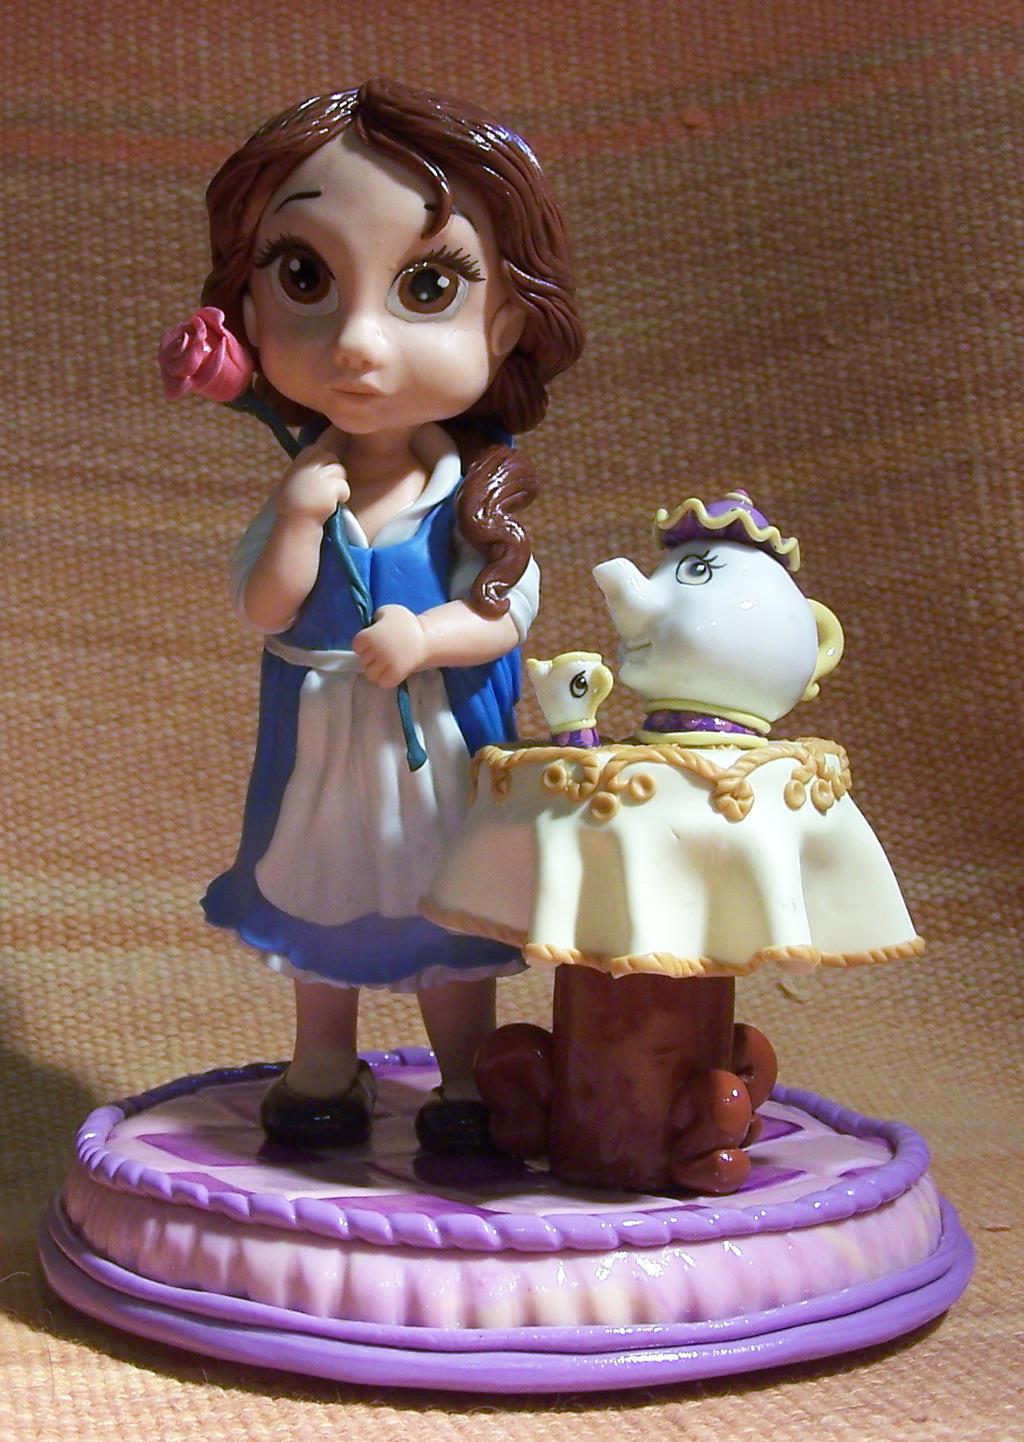 Belle by melinaminotti